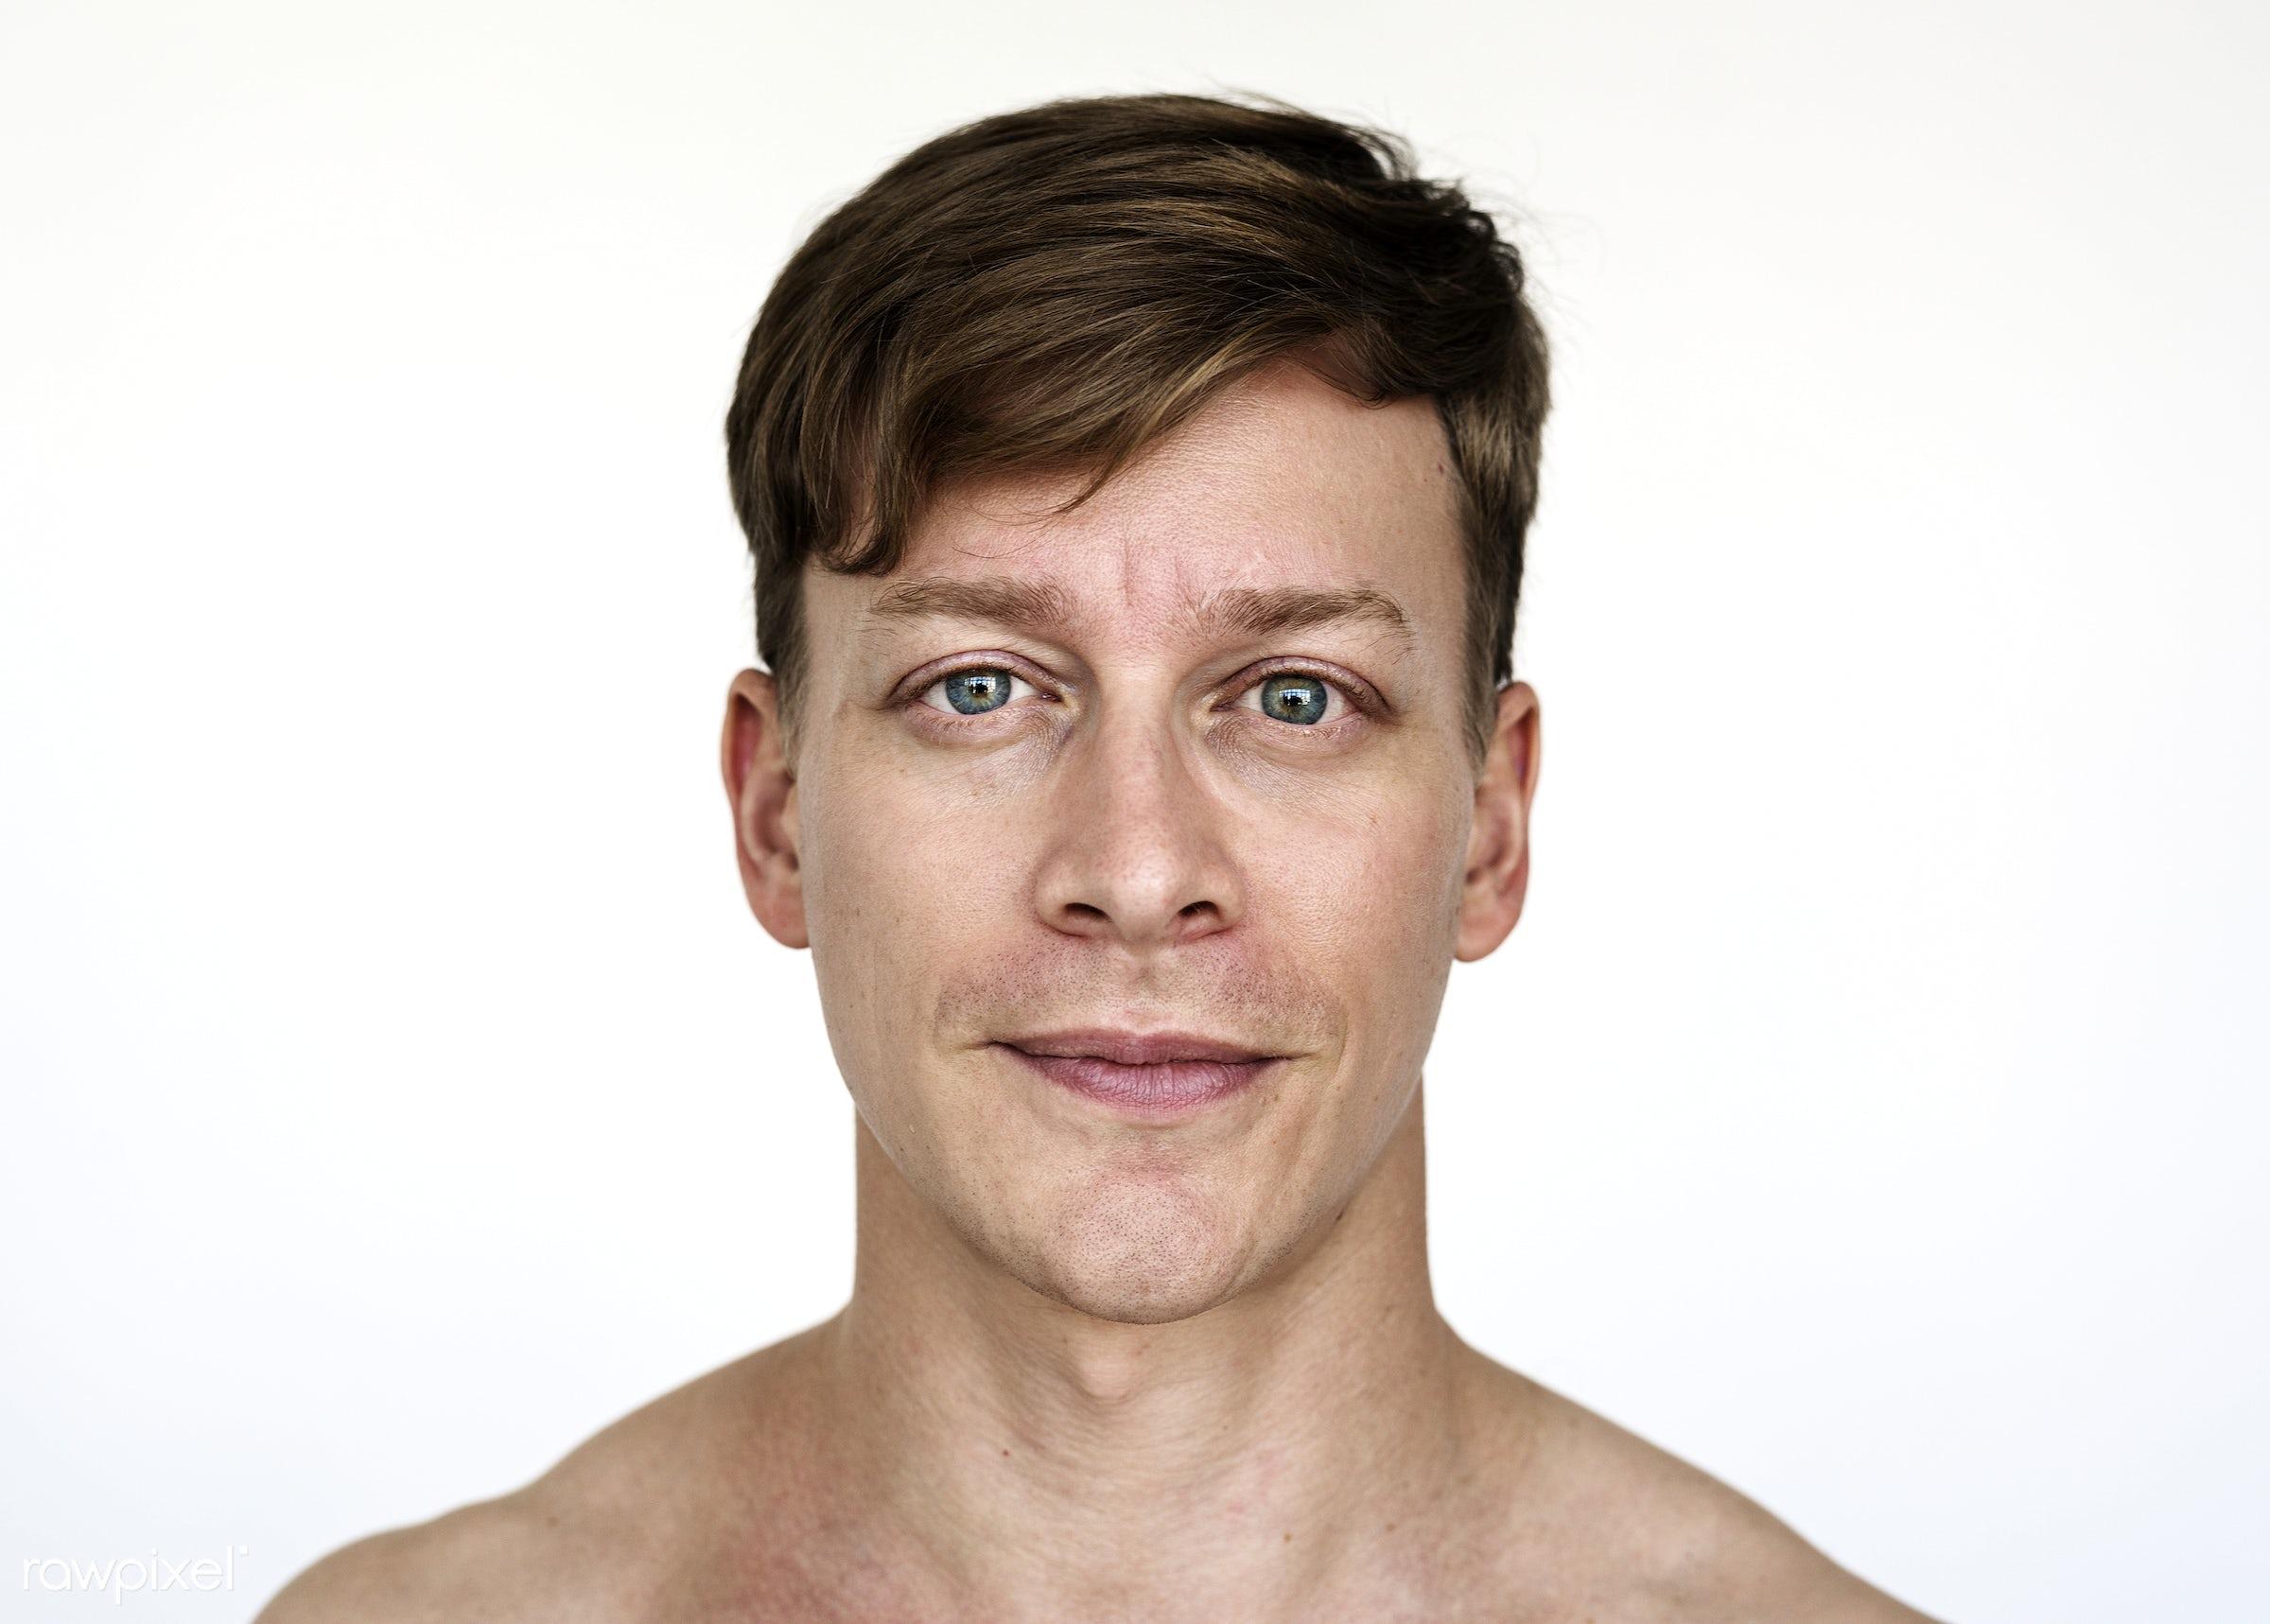 Portrait of an Austrian man - adult, alone, american, austria, austrian, caucasian, cheerful, closeup, content, europe,...